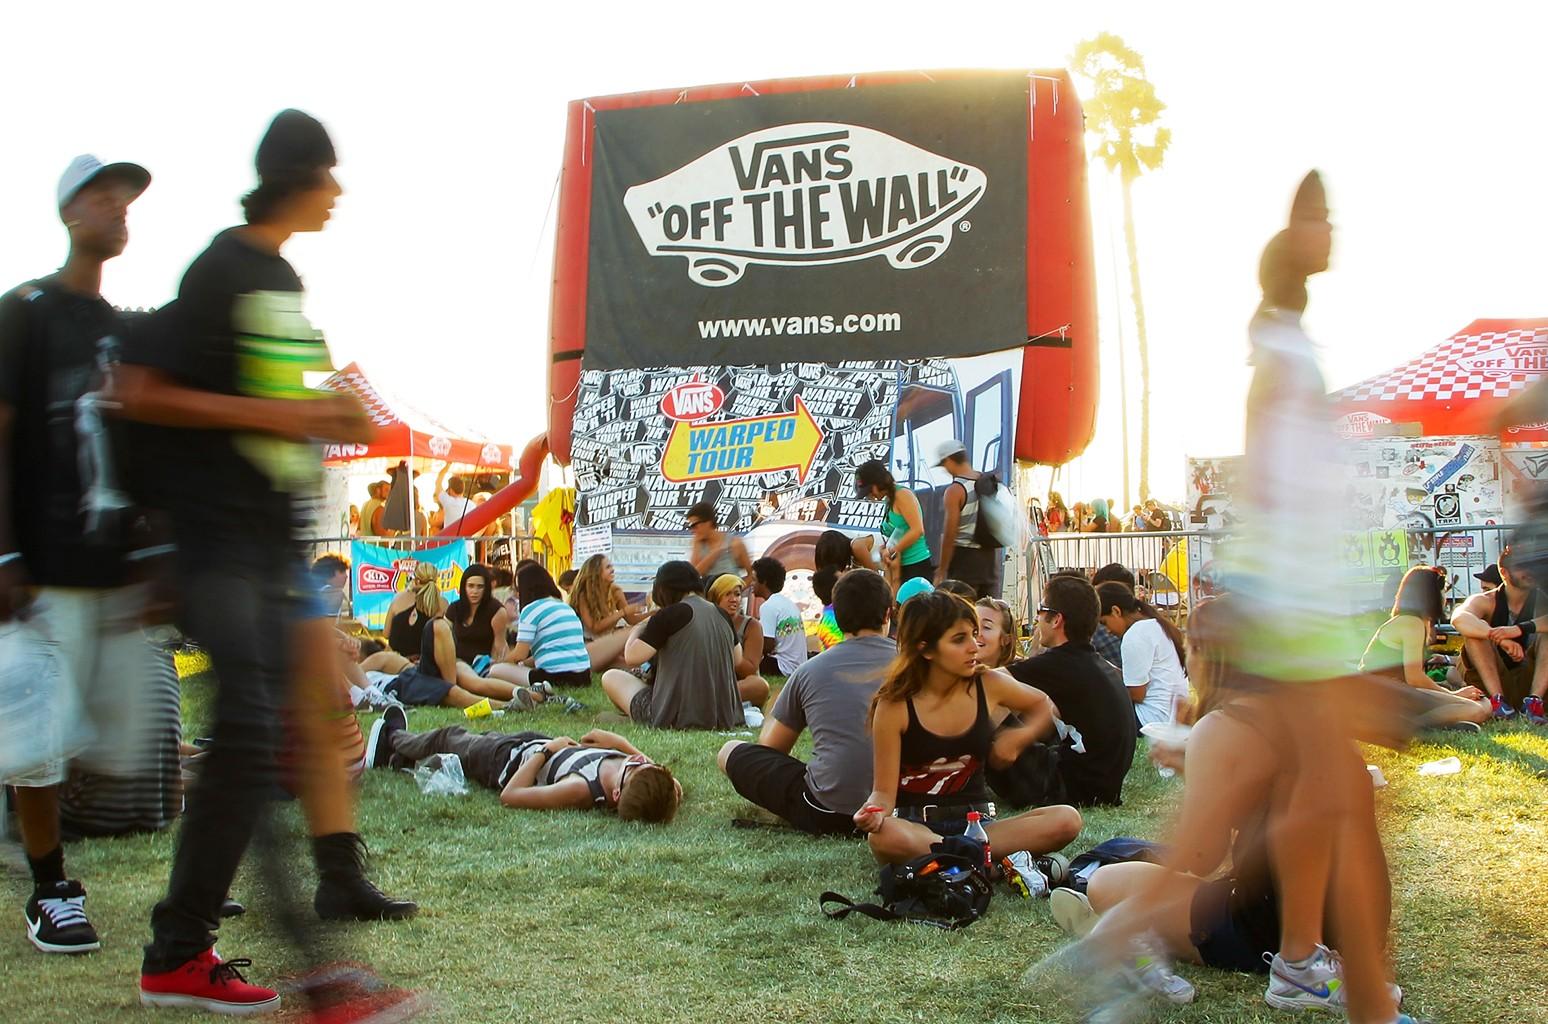 General atmosphere at the Vans Warped Tour in Pomona, Calif.